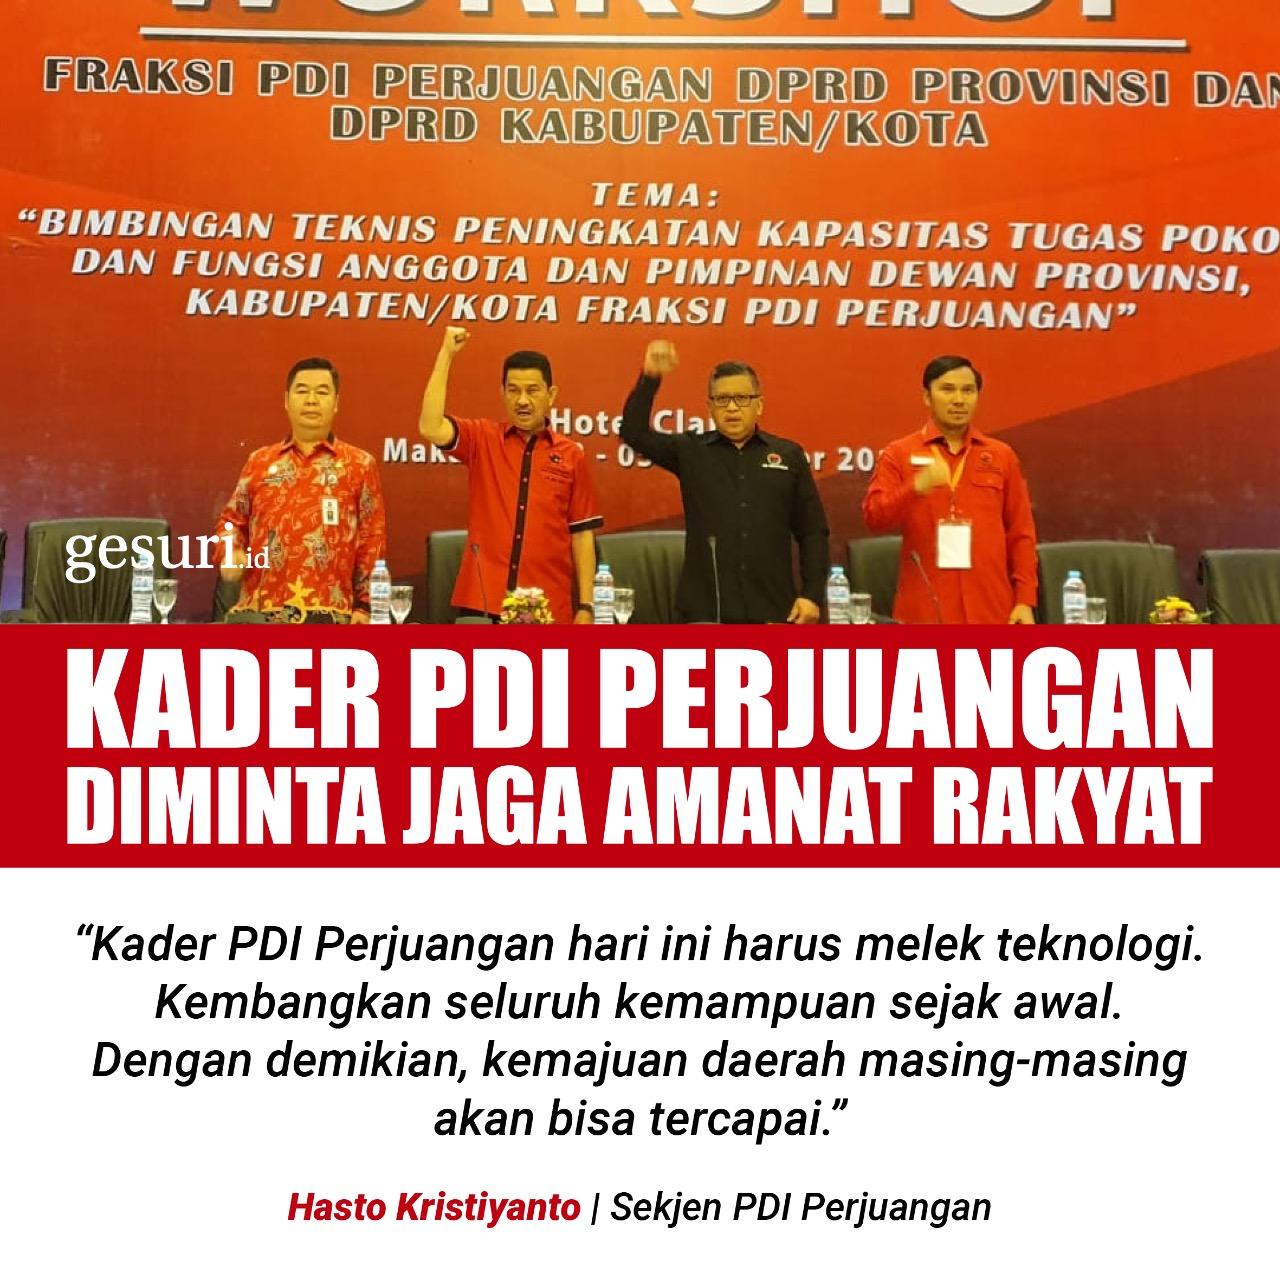 Kader PDI Perjuangan Diminta untuk Jaga Amanat Rakyat